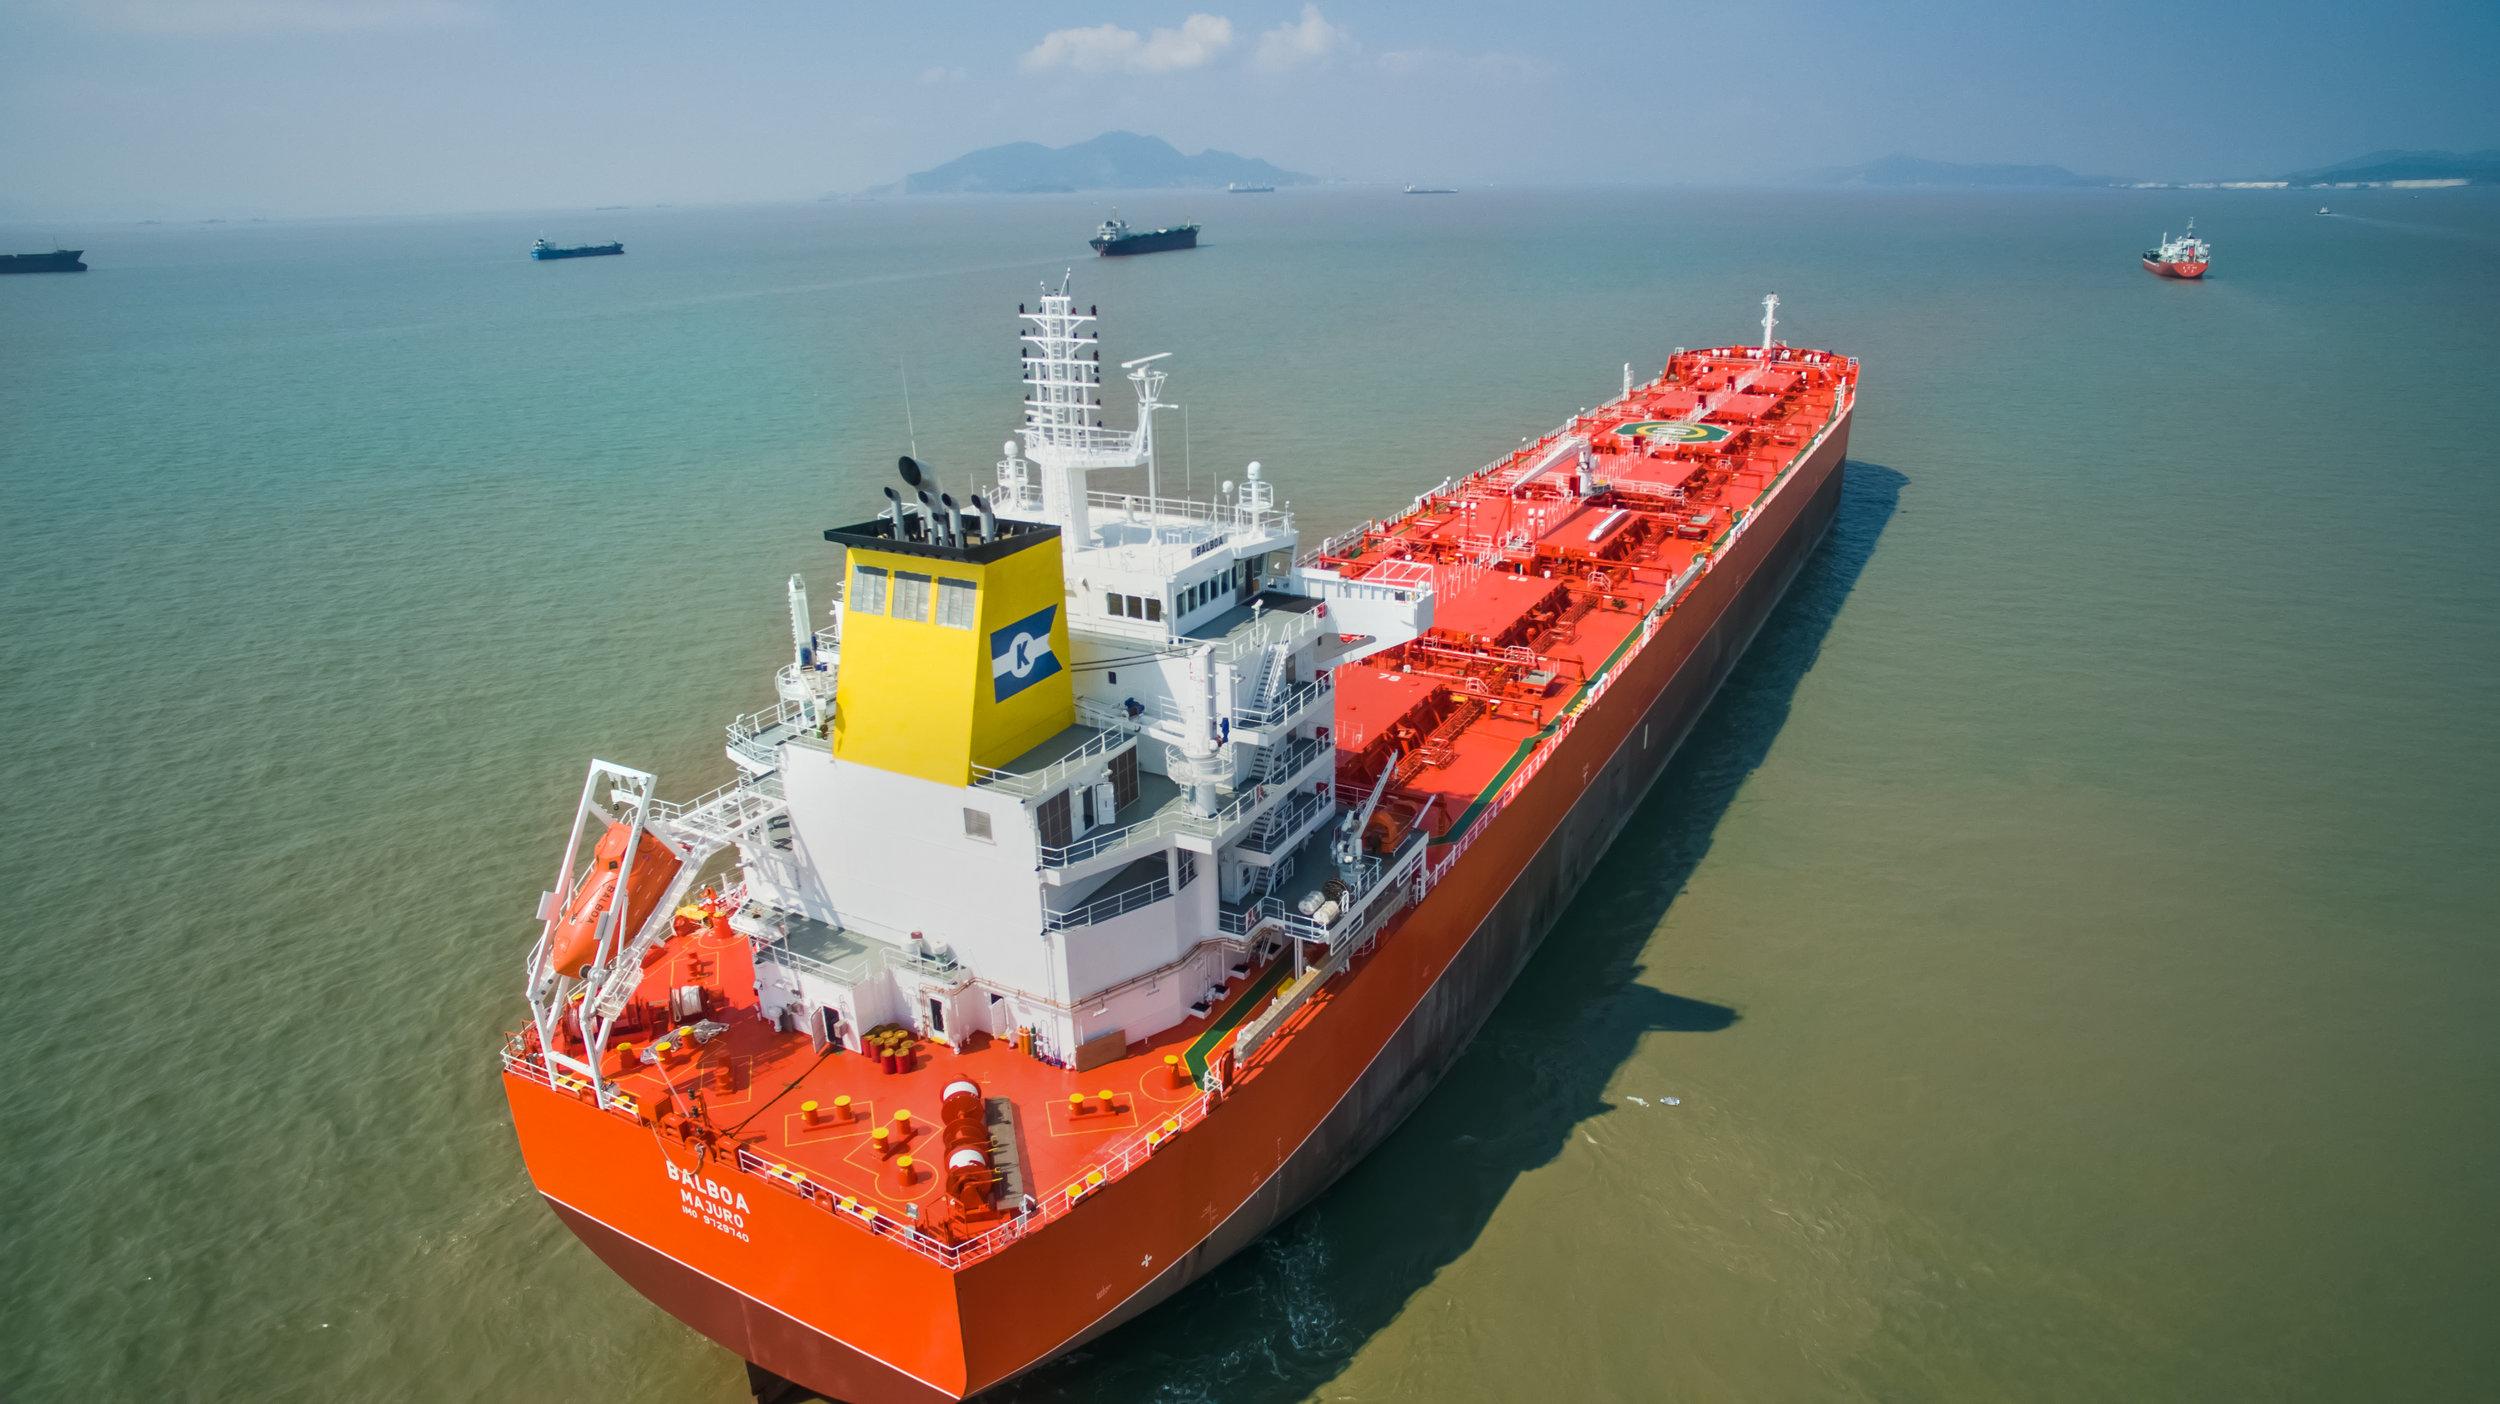 Combination carrier MV Balboa